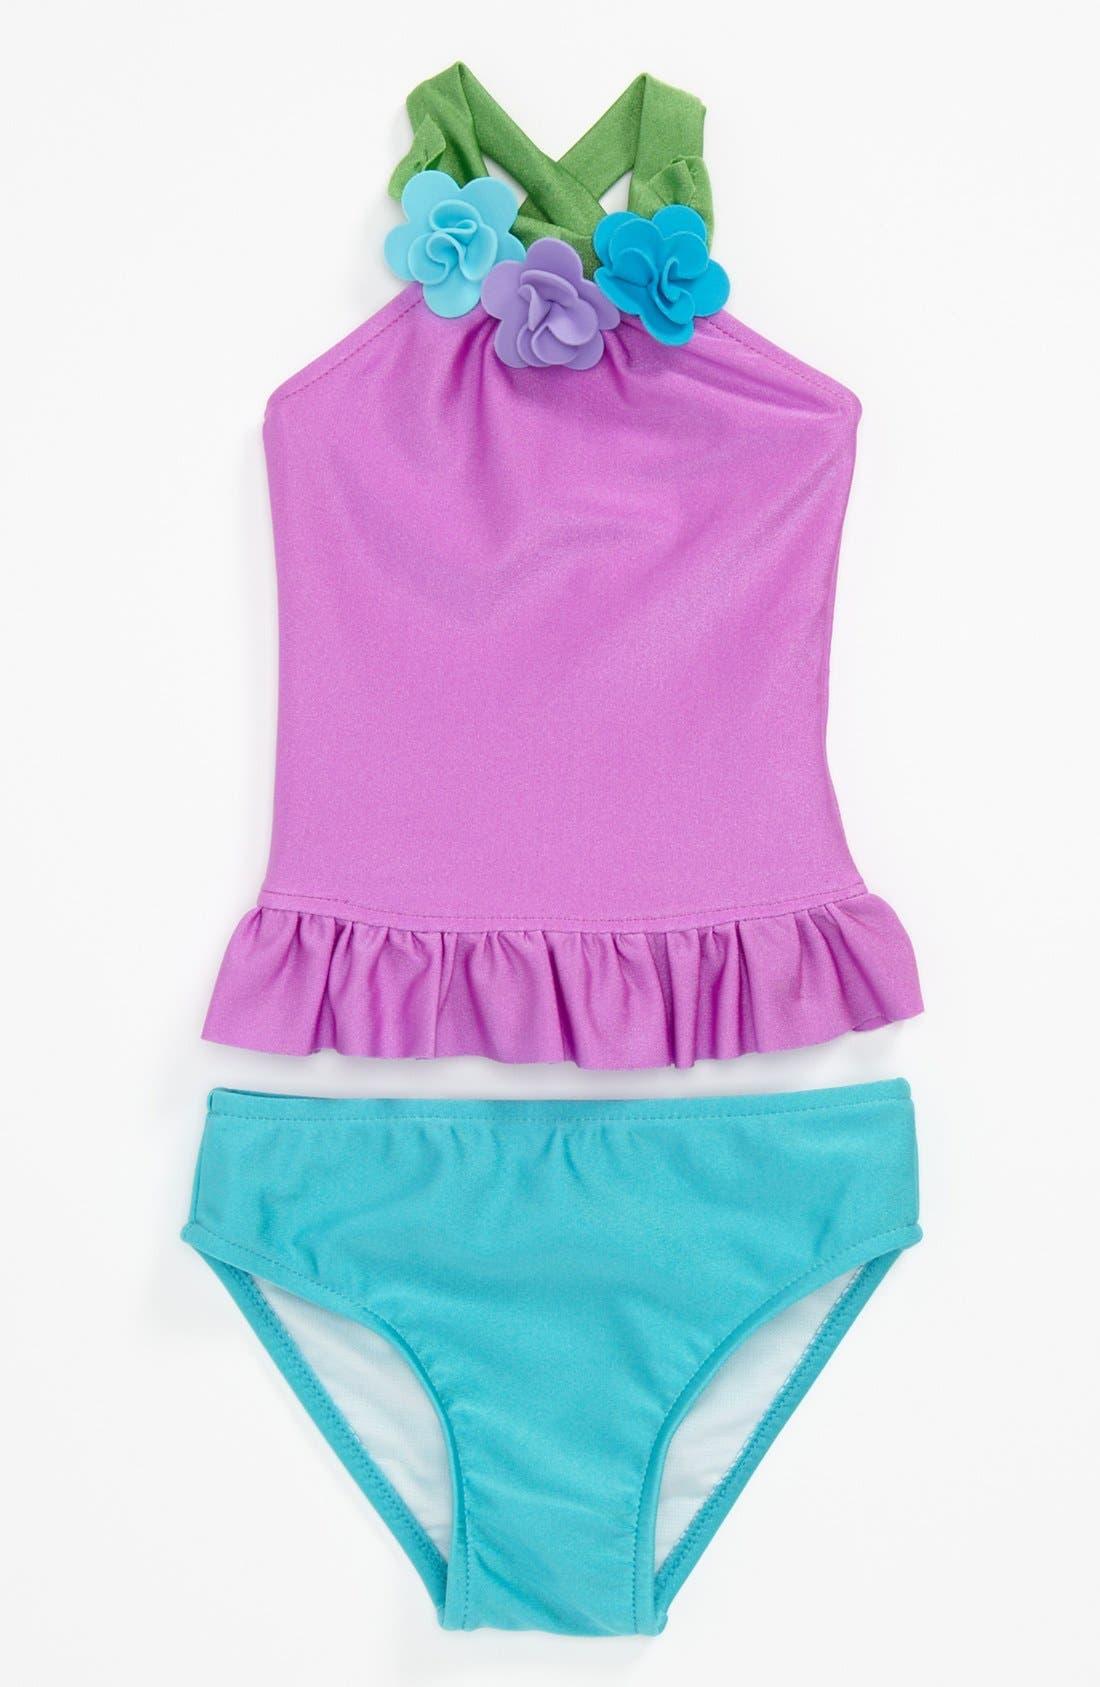 Main Image - Love U Lots Two Piece Swimsuit (Baby)